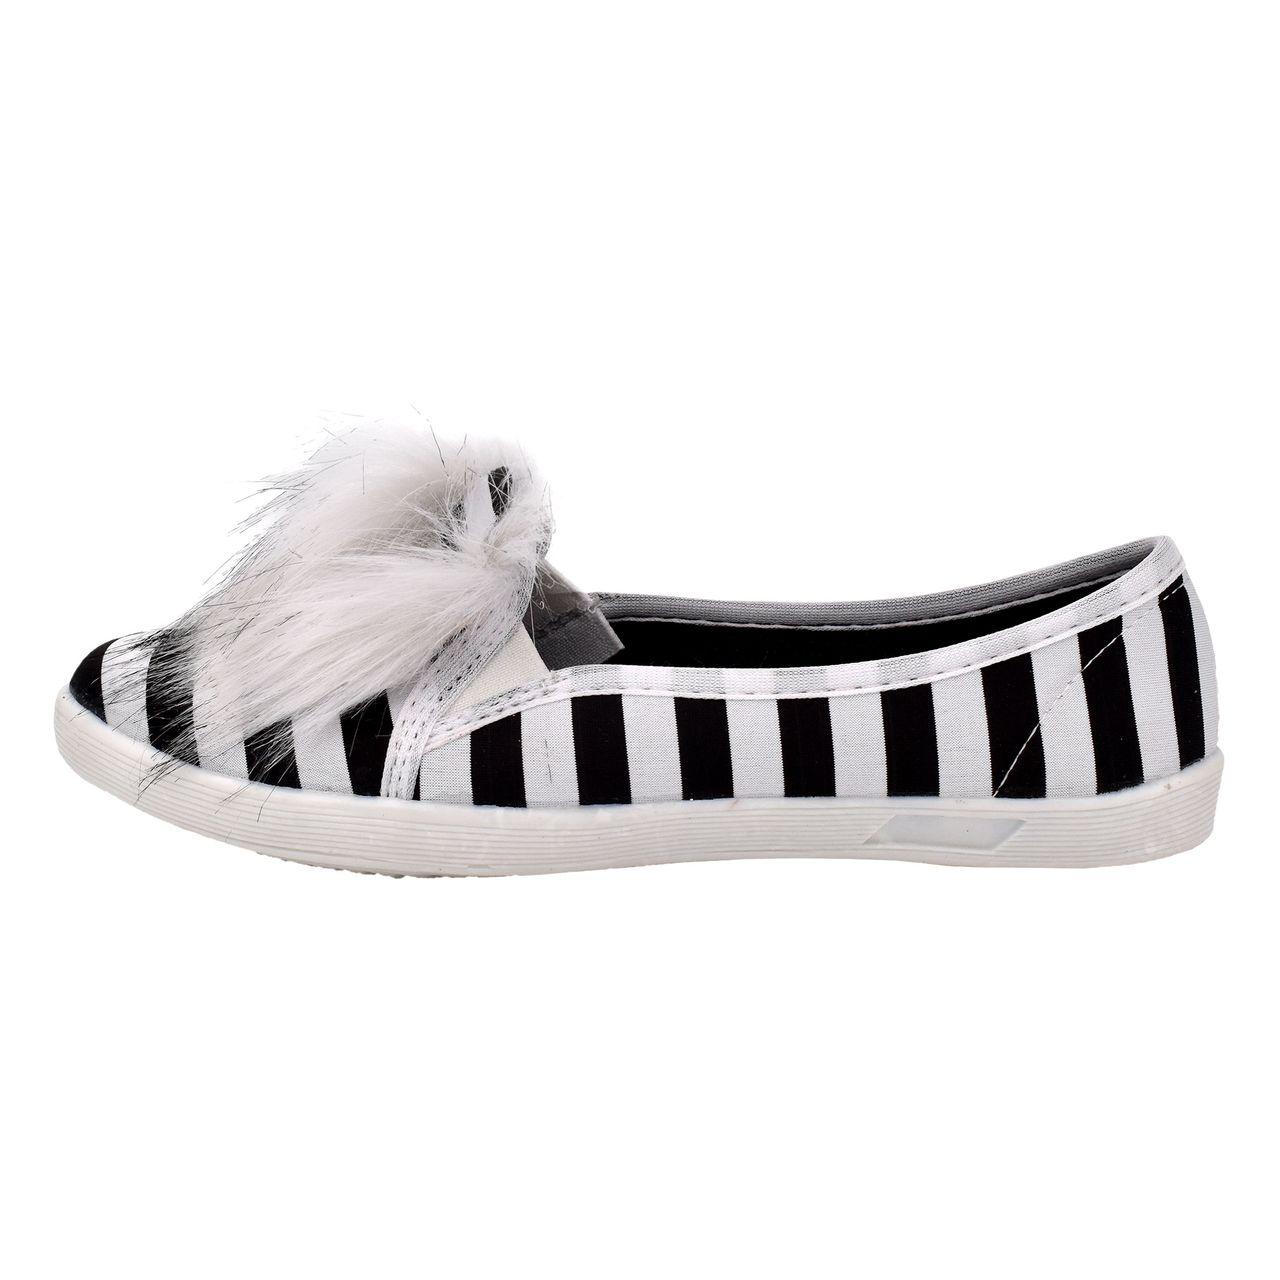 کفش روزمره زنانه مدل پینو کد 8722